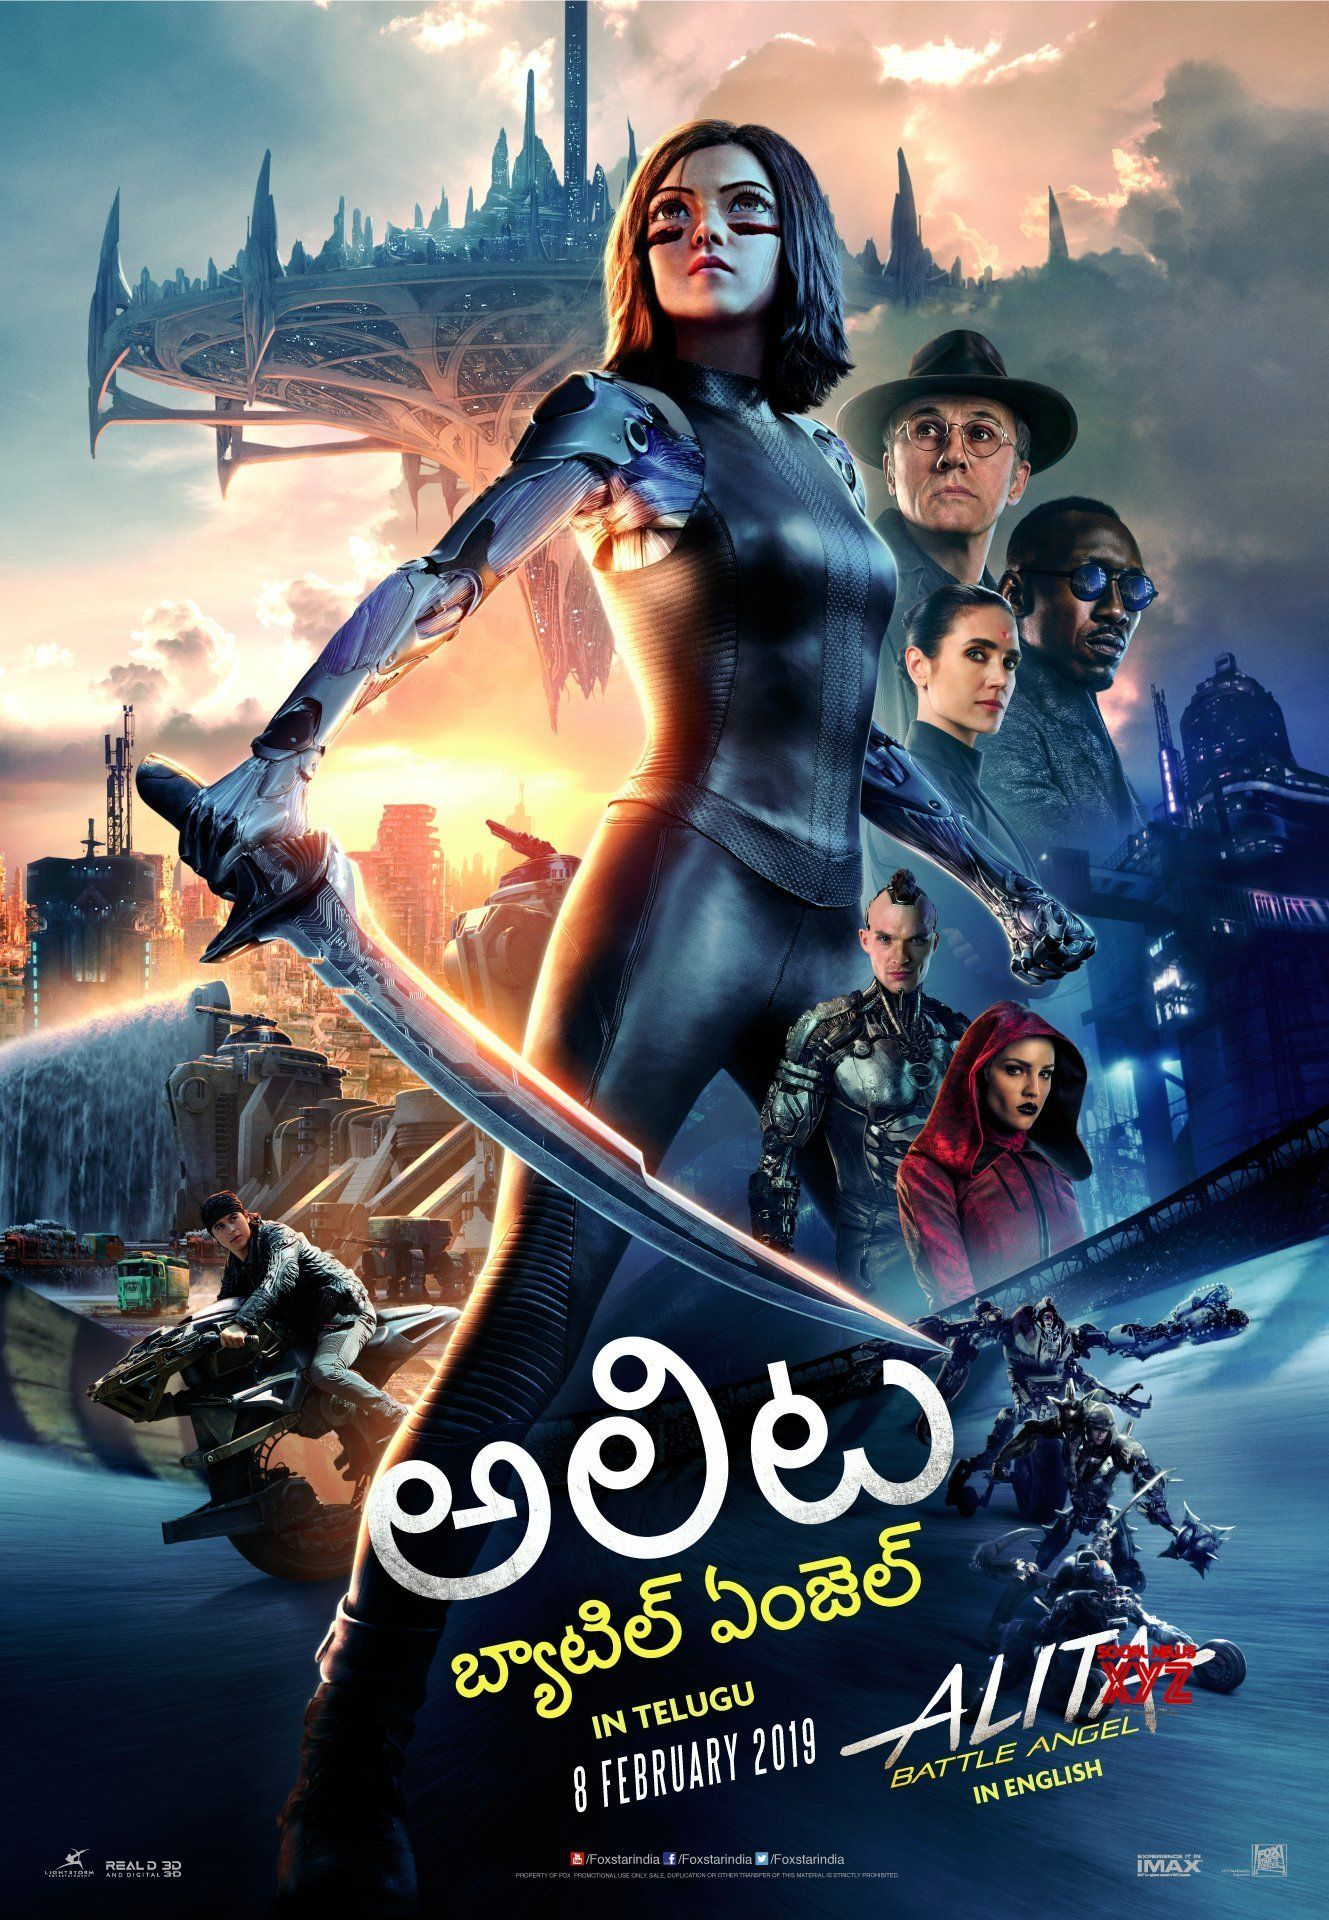 Alitabattleangel Movie Releasing Across India On February Th